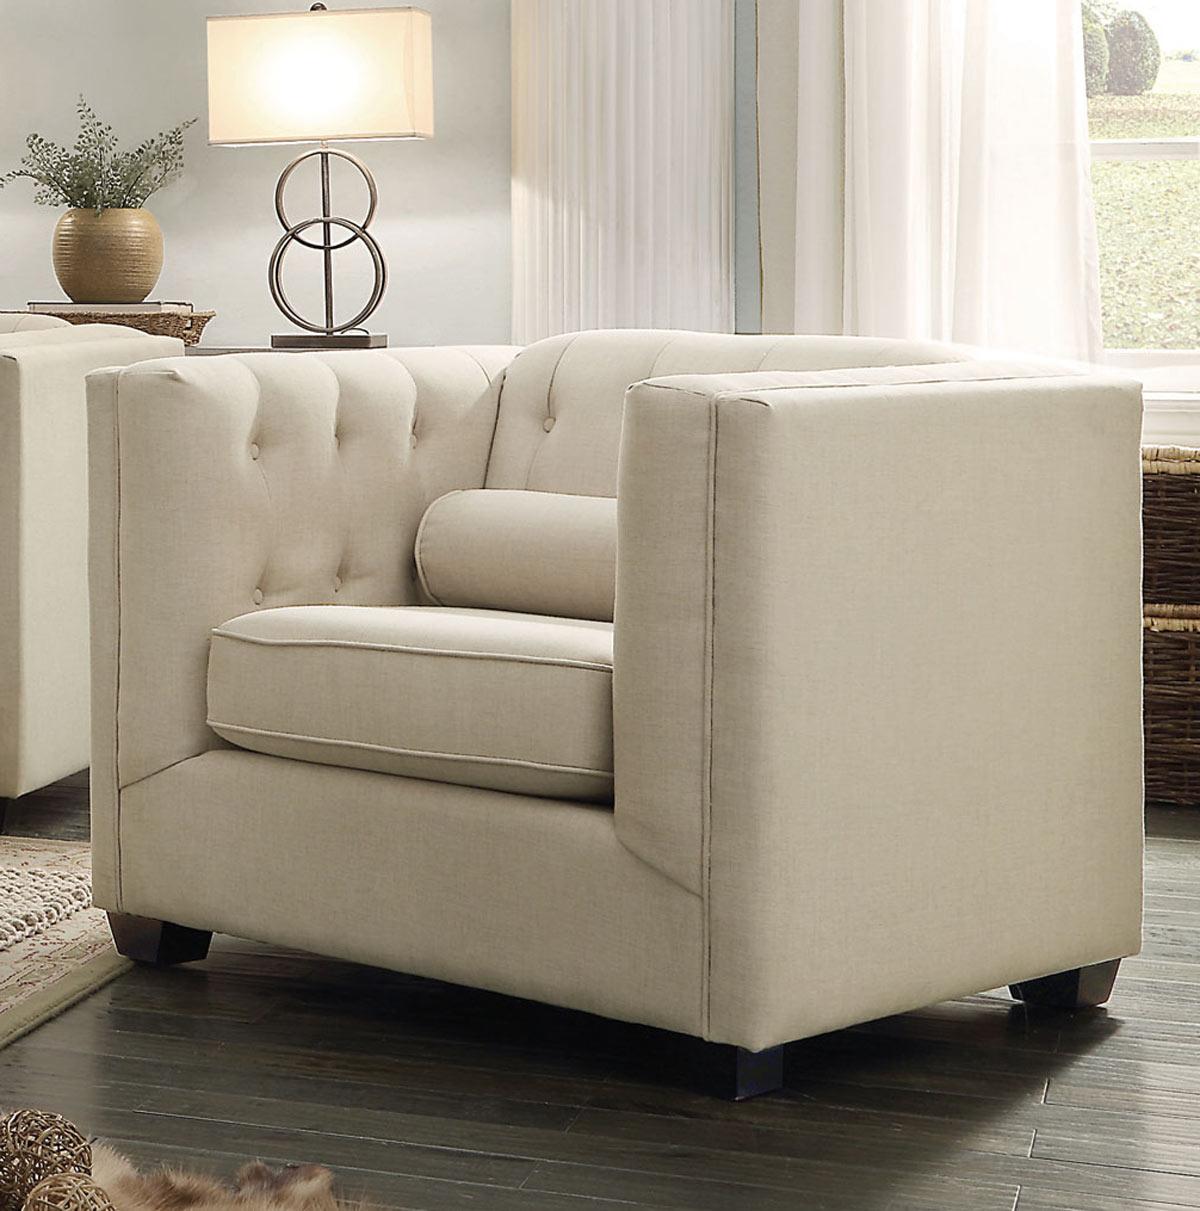 Coaster Cairns Chair - Oatmeal